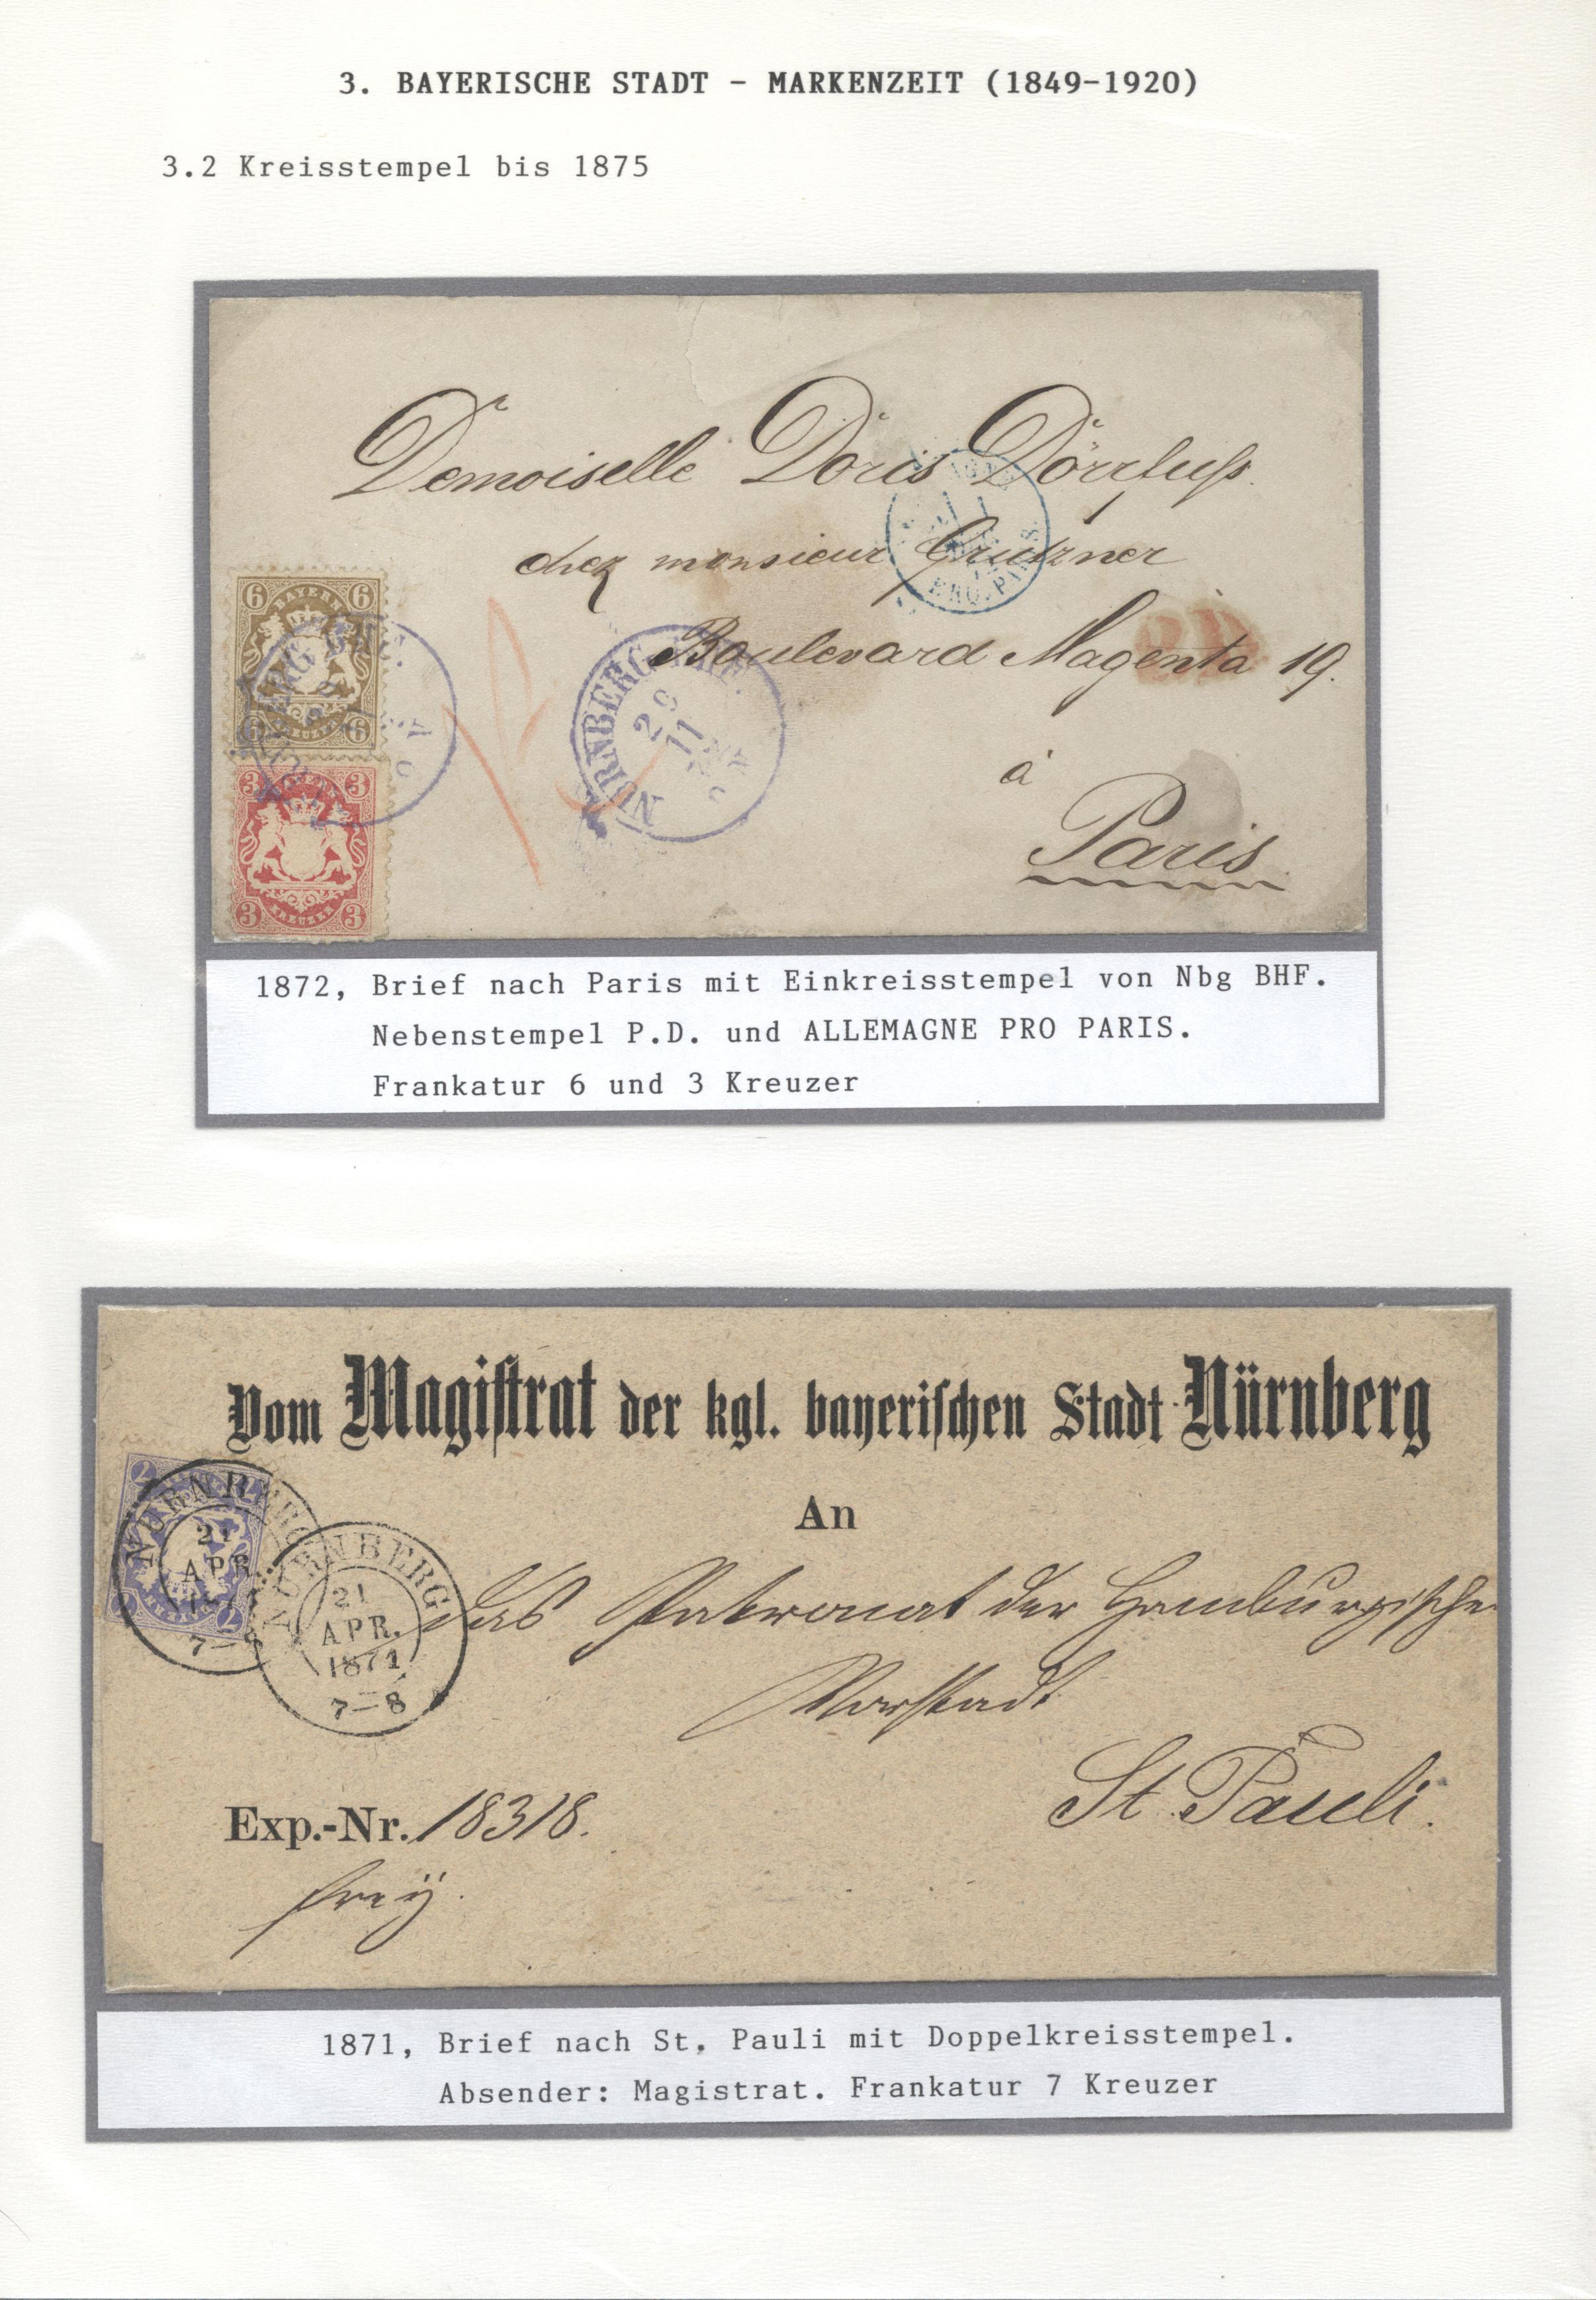 Lot 36172 - Bayern - Marken und Briefe  -  Auktionshaus Christoph Gärtner GmbH & Co. KG Sale #44 Collections Germany